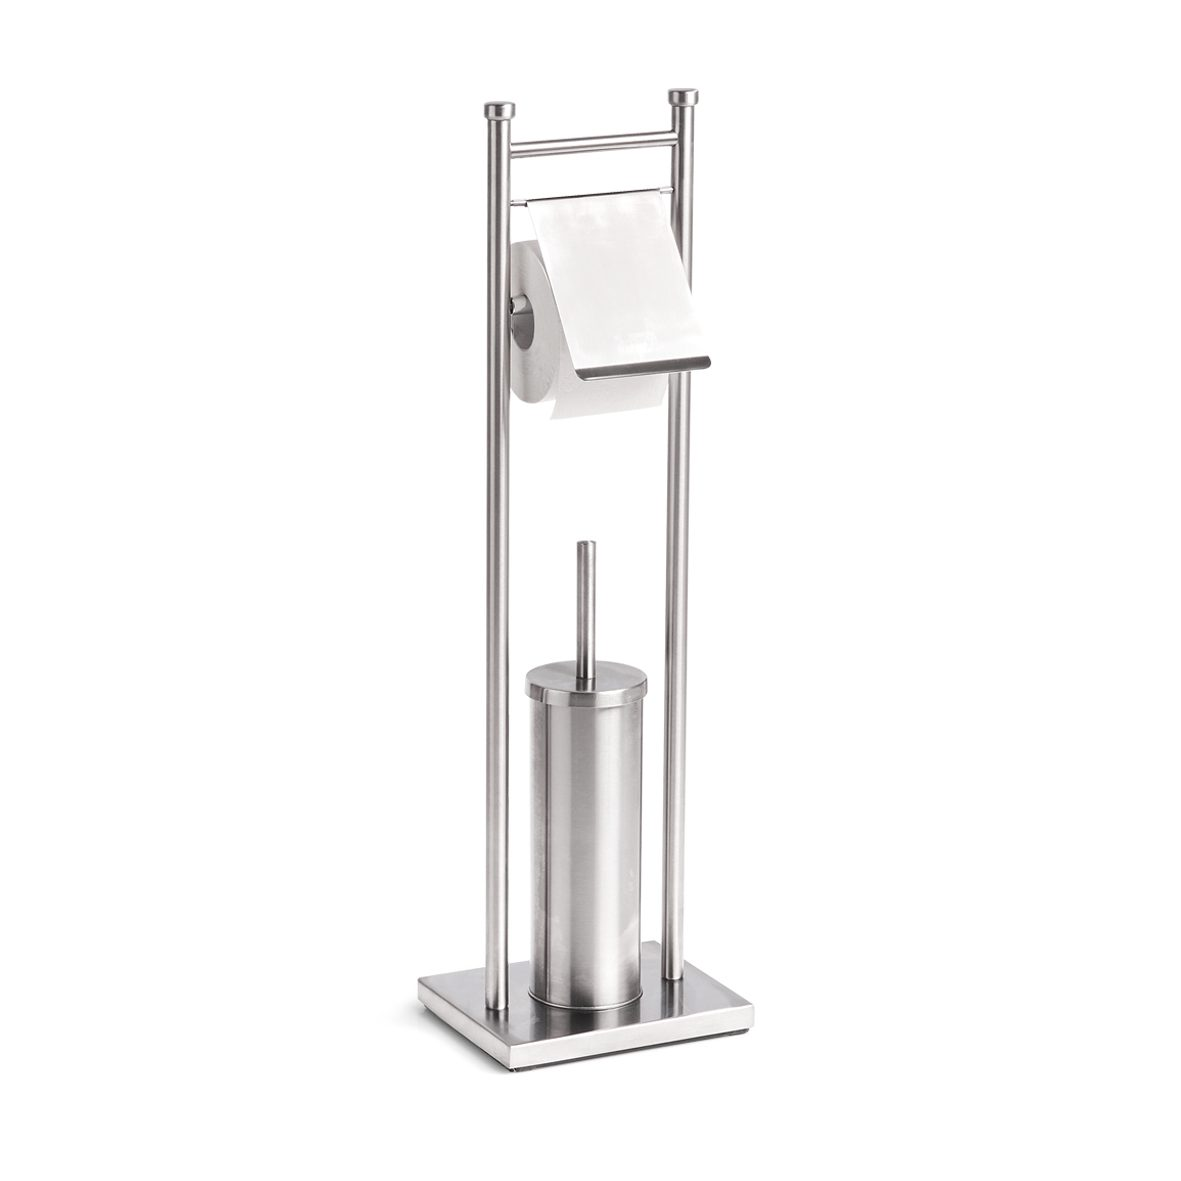 Mobel Bernskotter Gmbh Raume Badezimmer Accessoires Kela